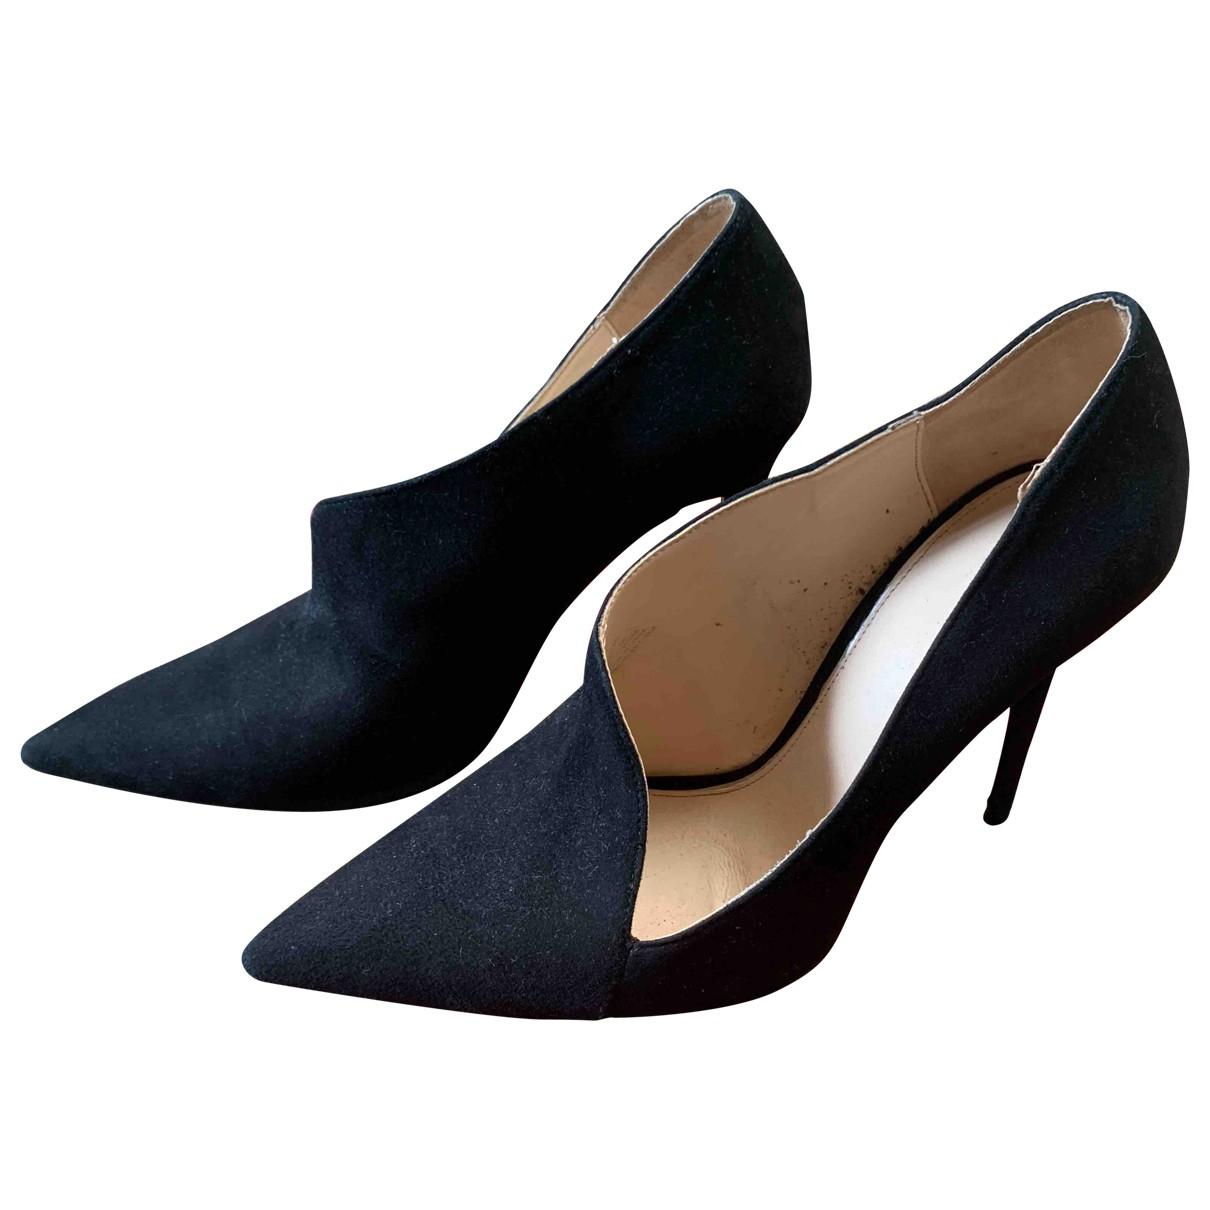 Zara \N Black Suede Heels for Women 40 EU